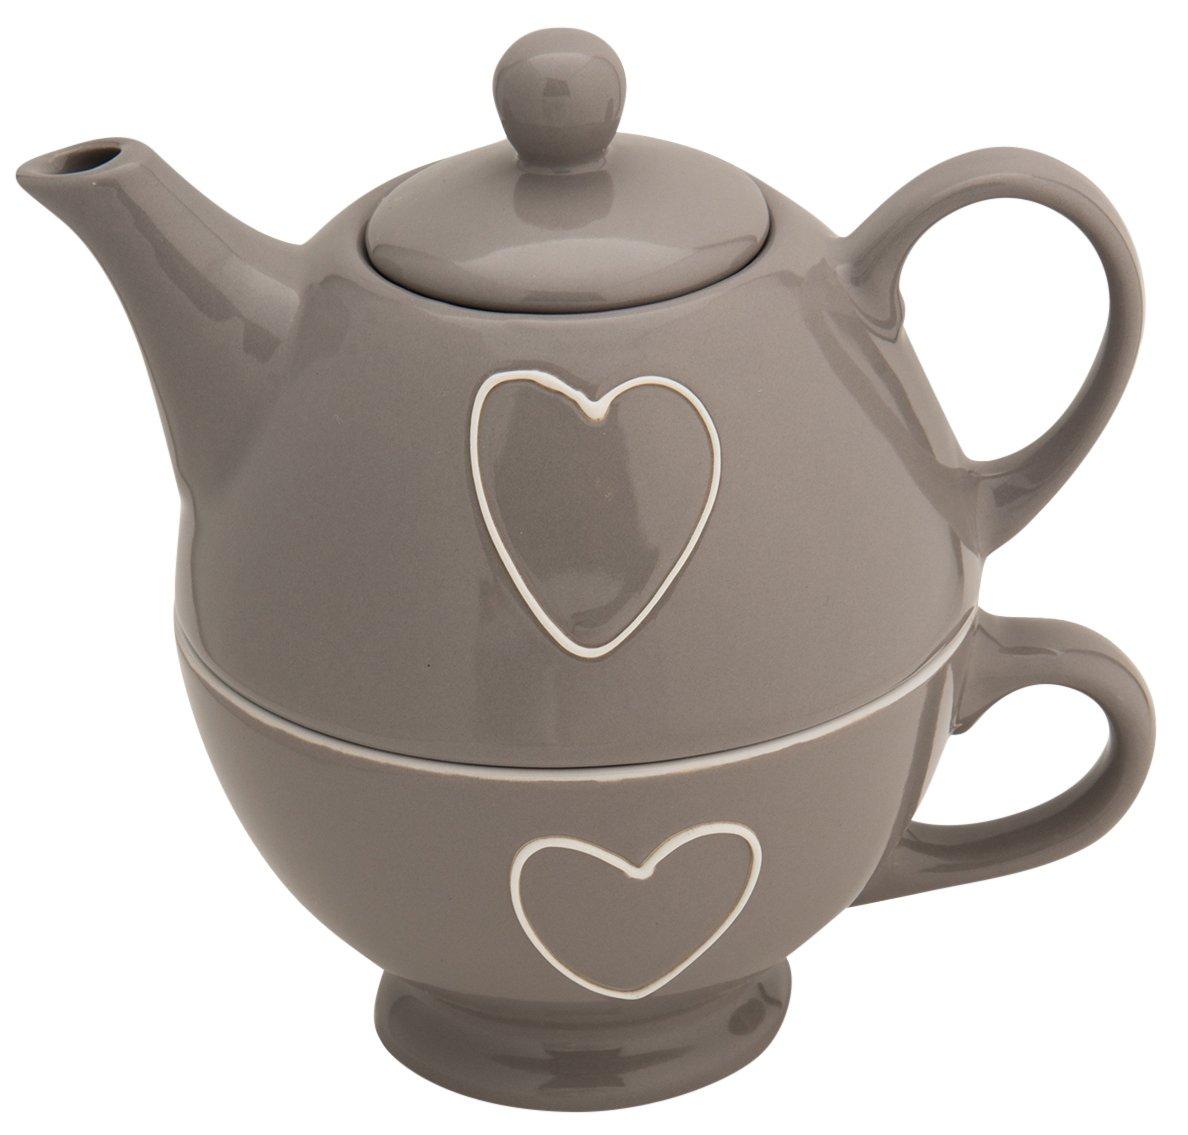 CHICCIE Herz Teekanne mit Becher Set - Tee Service Keramik Teebecher